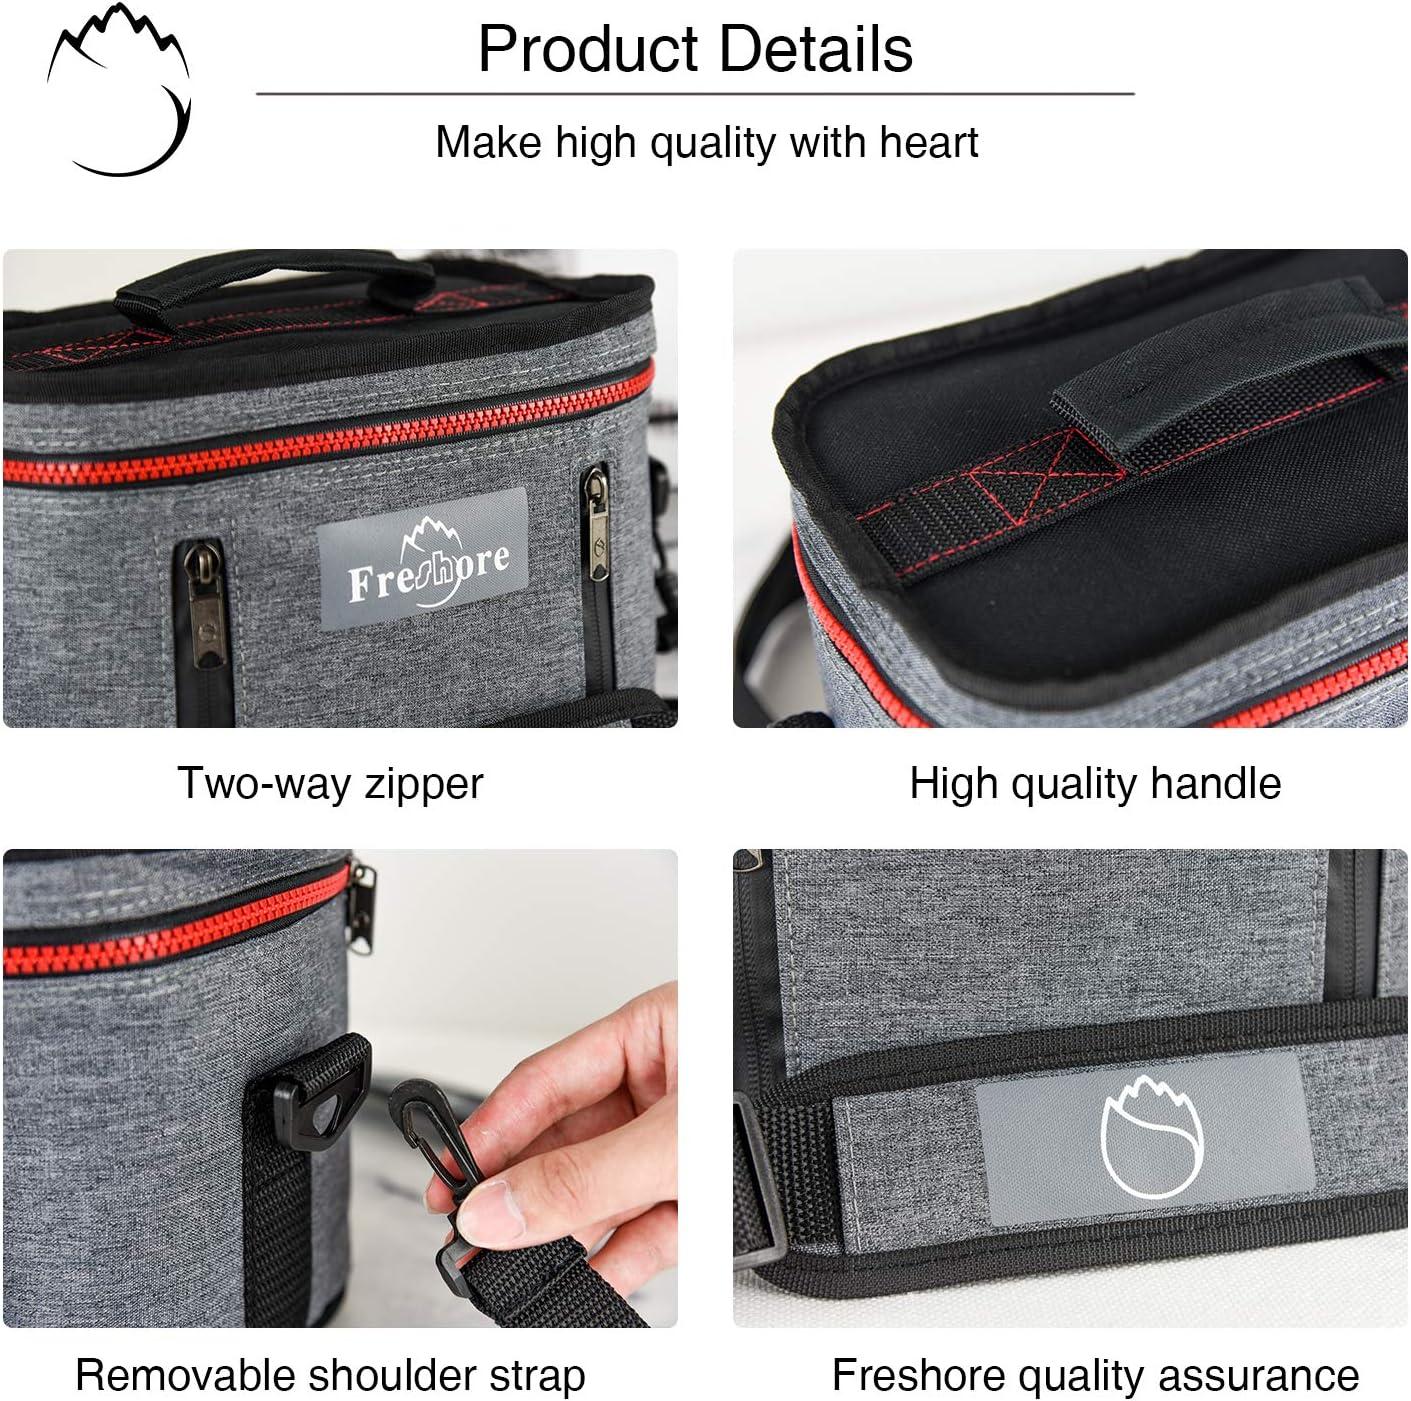 Fresho Insulated Lunch Kit Tote Slim Box Bolsas peque/ñas para mujeres//hombres 丨 Compact Storage Comidas Contenedores Ice Pack gris oscuro Crossbody con correa de hombro ajustable